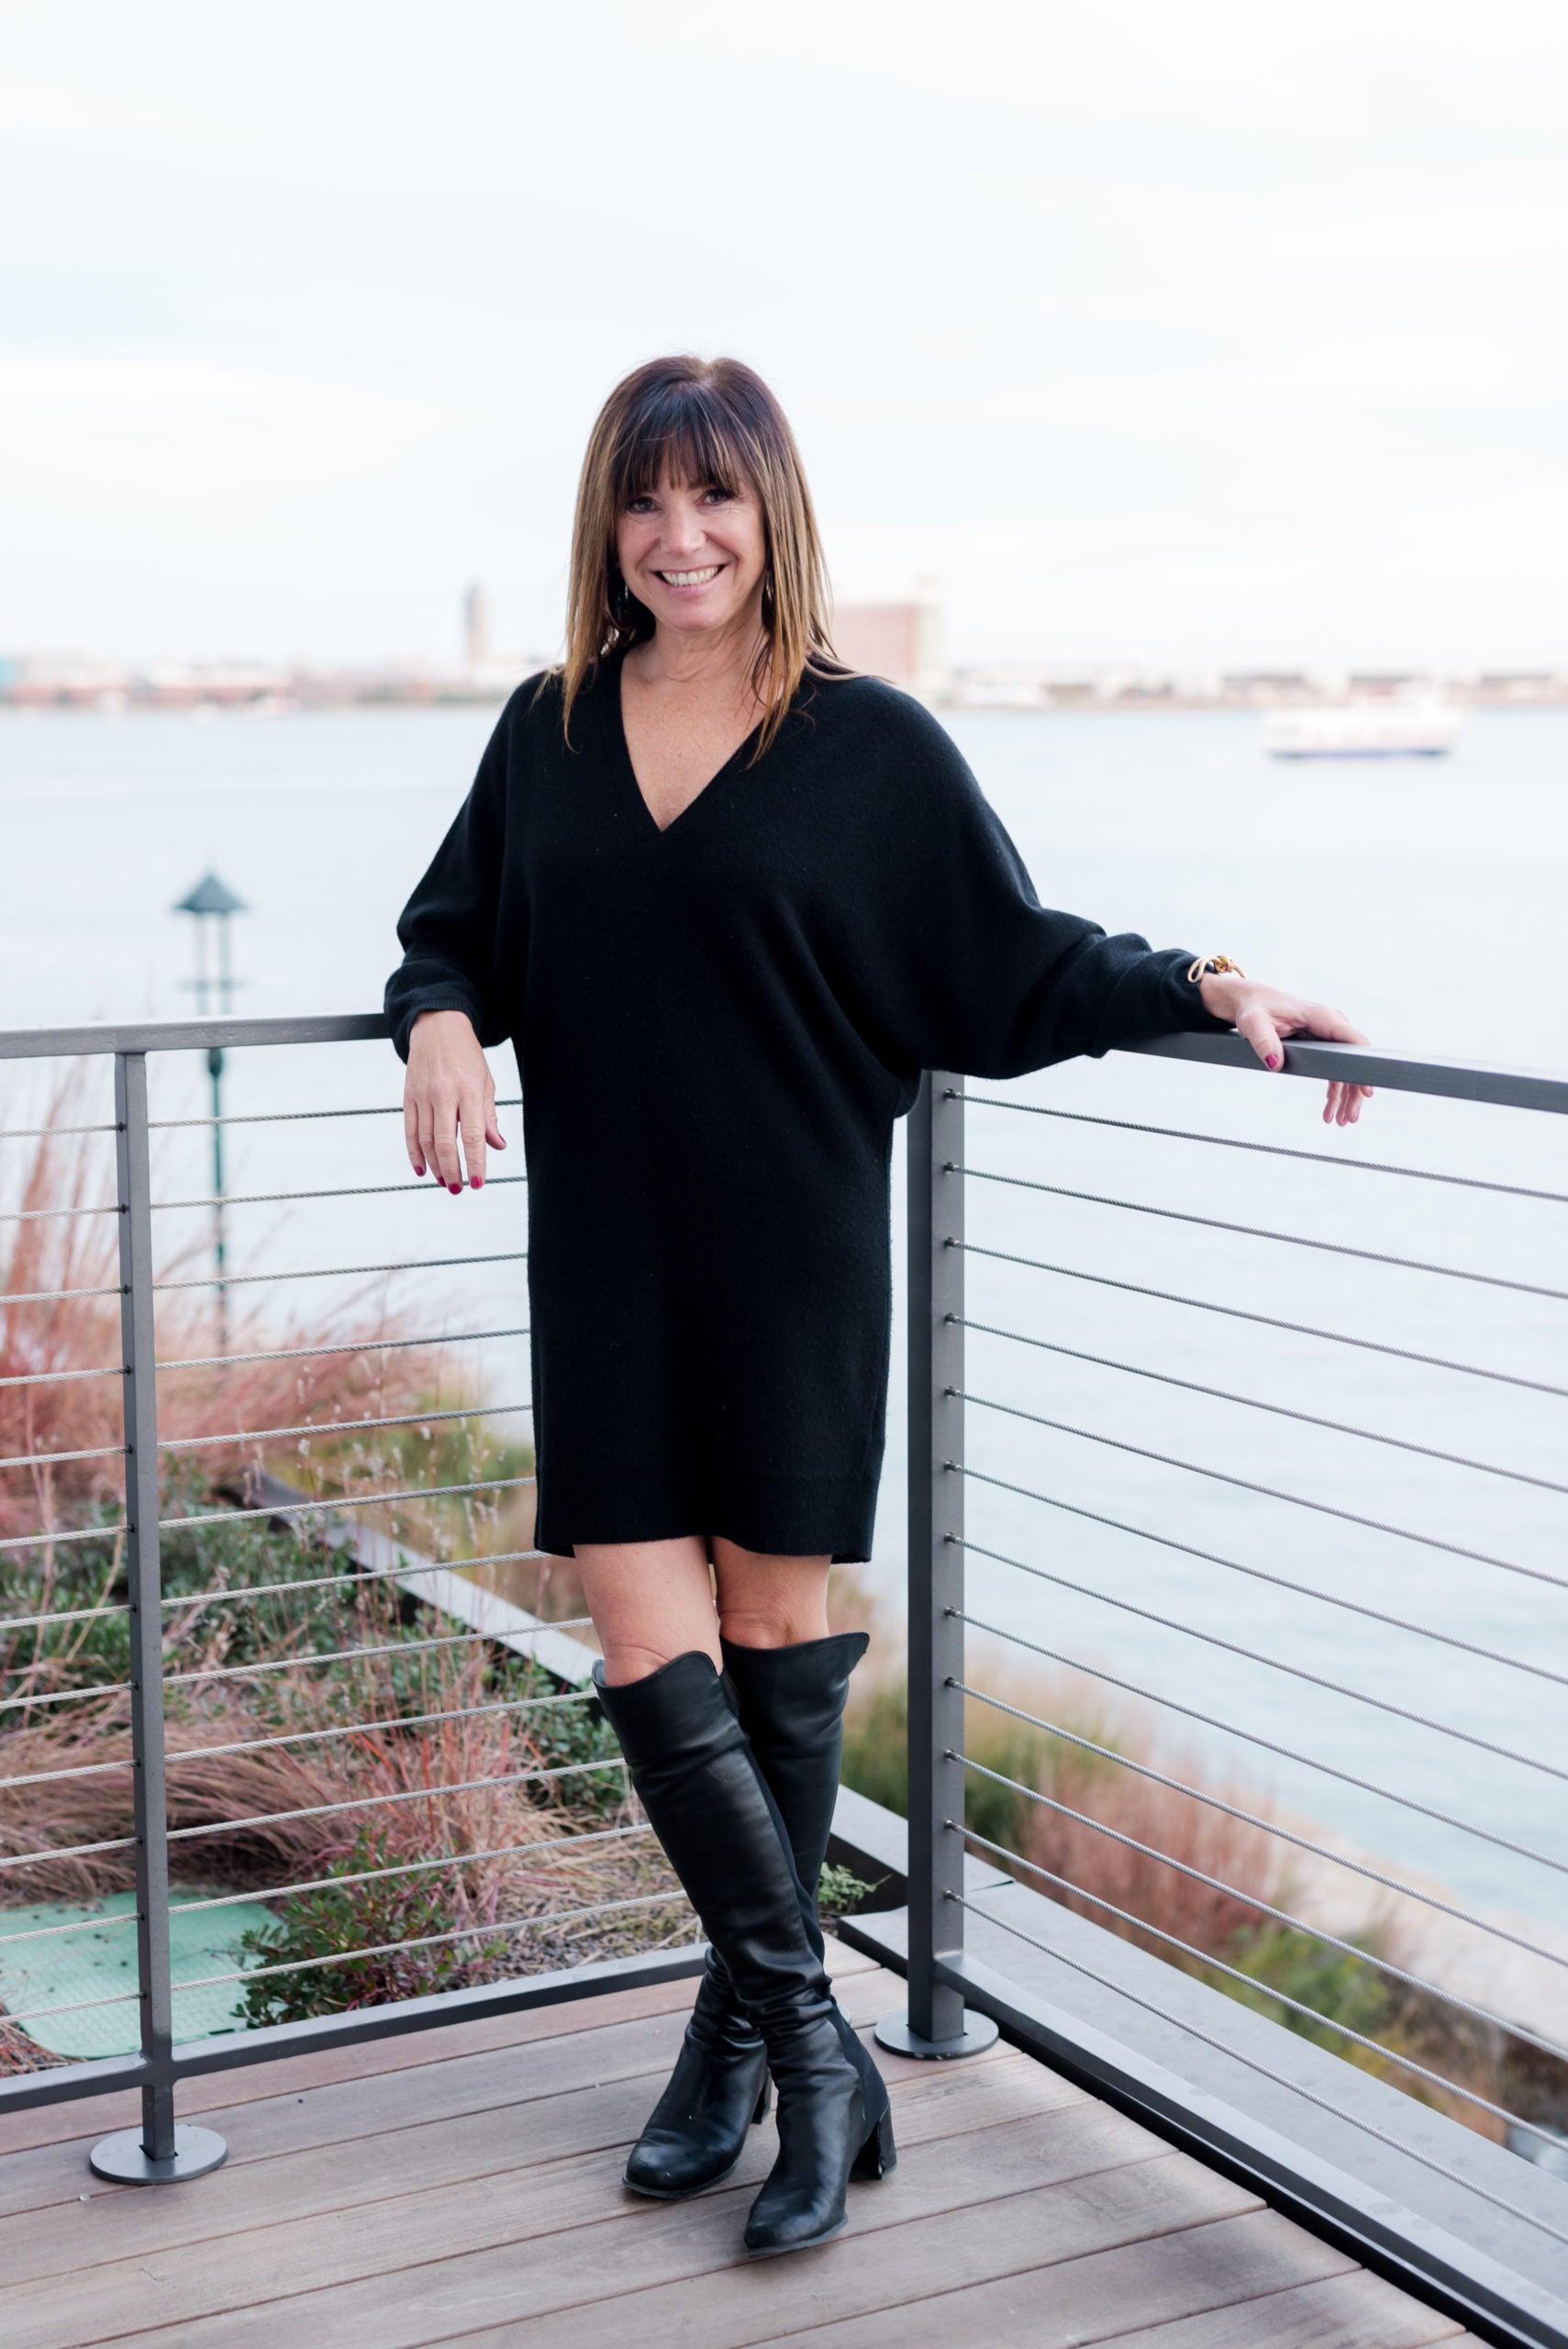 Kristin Canty